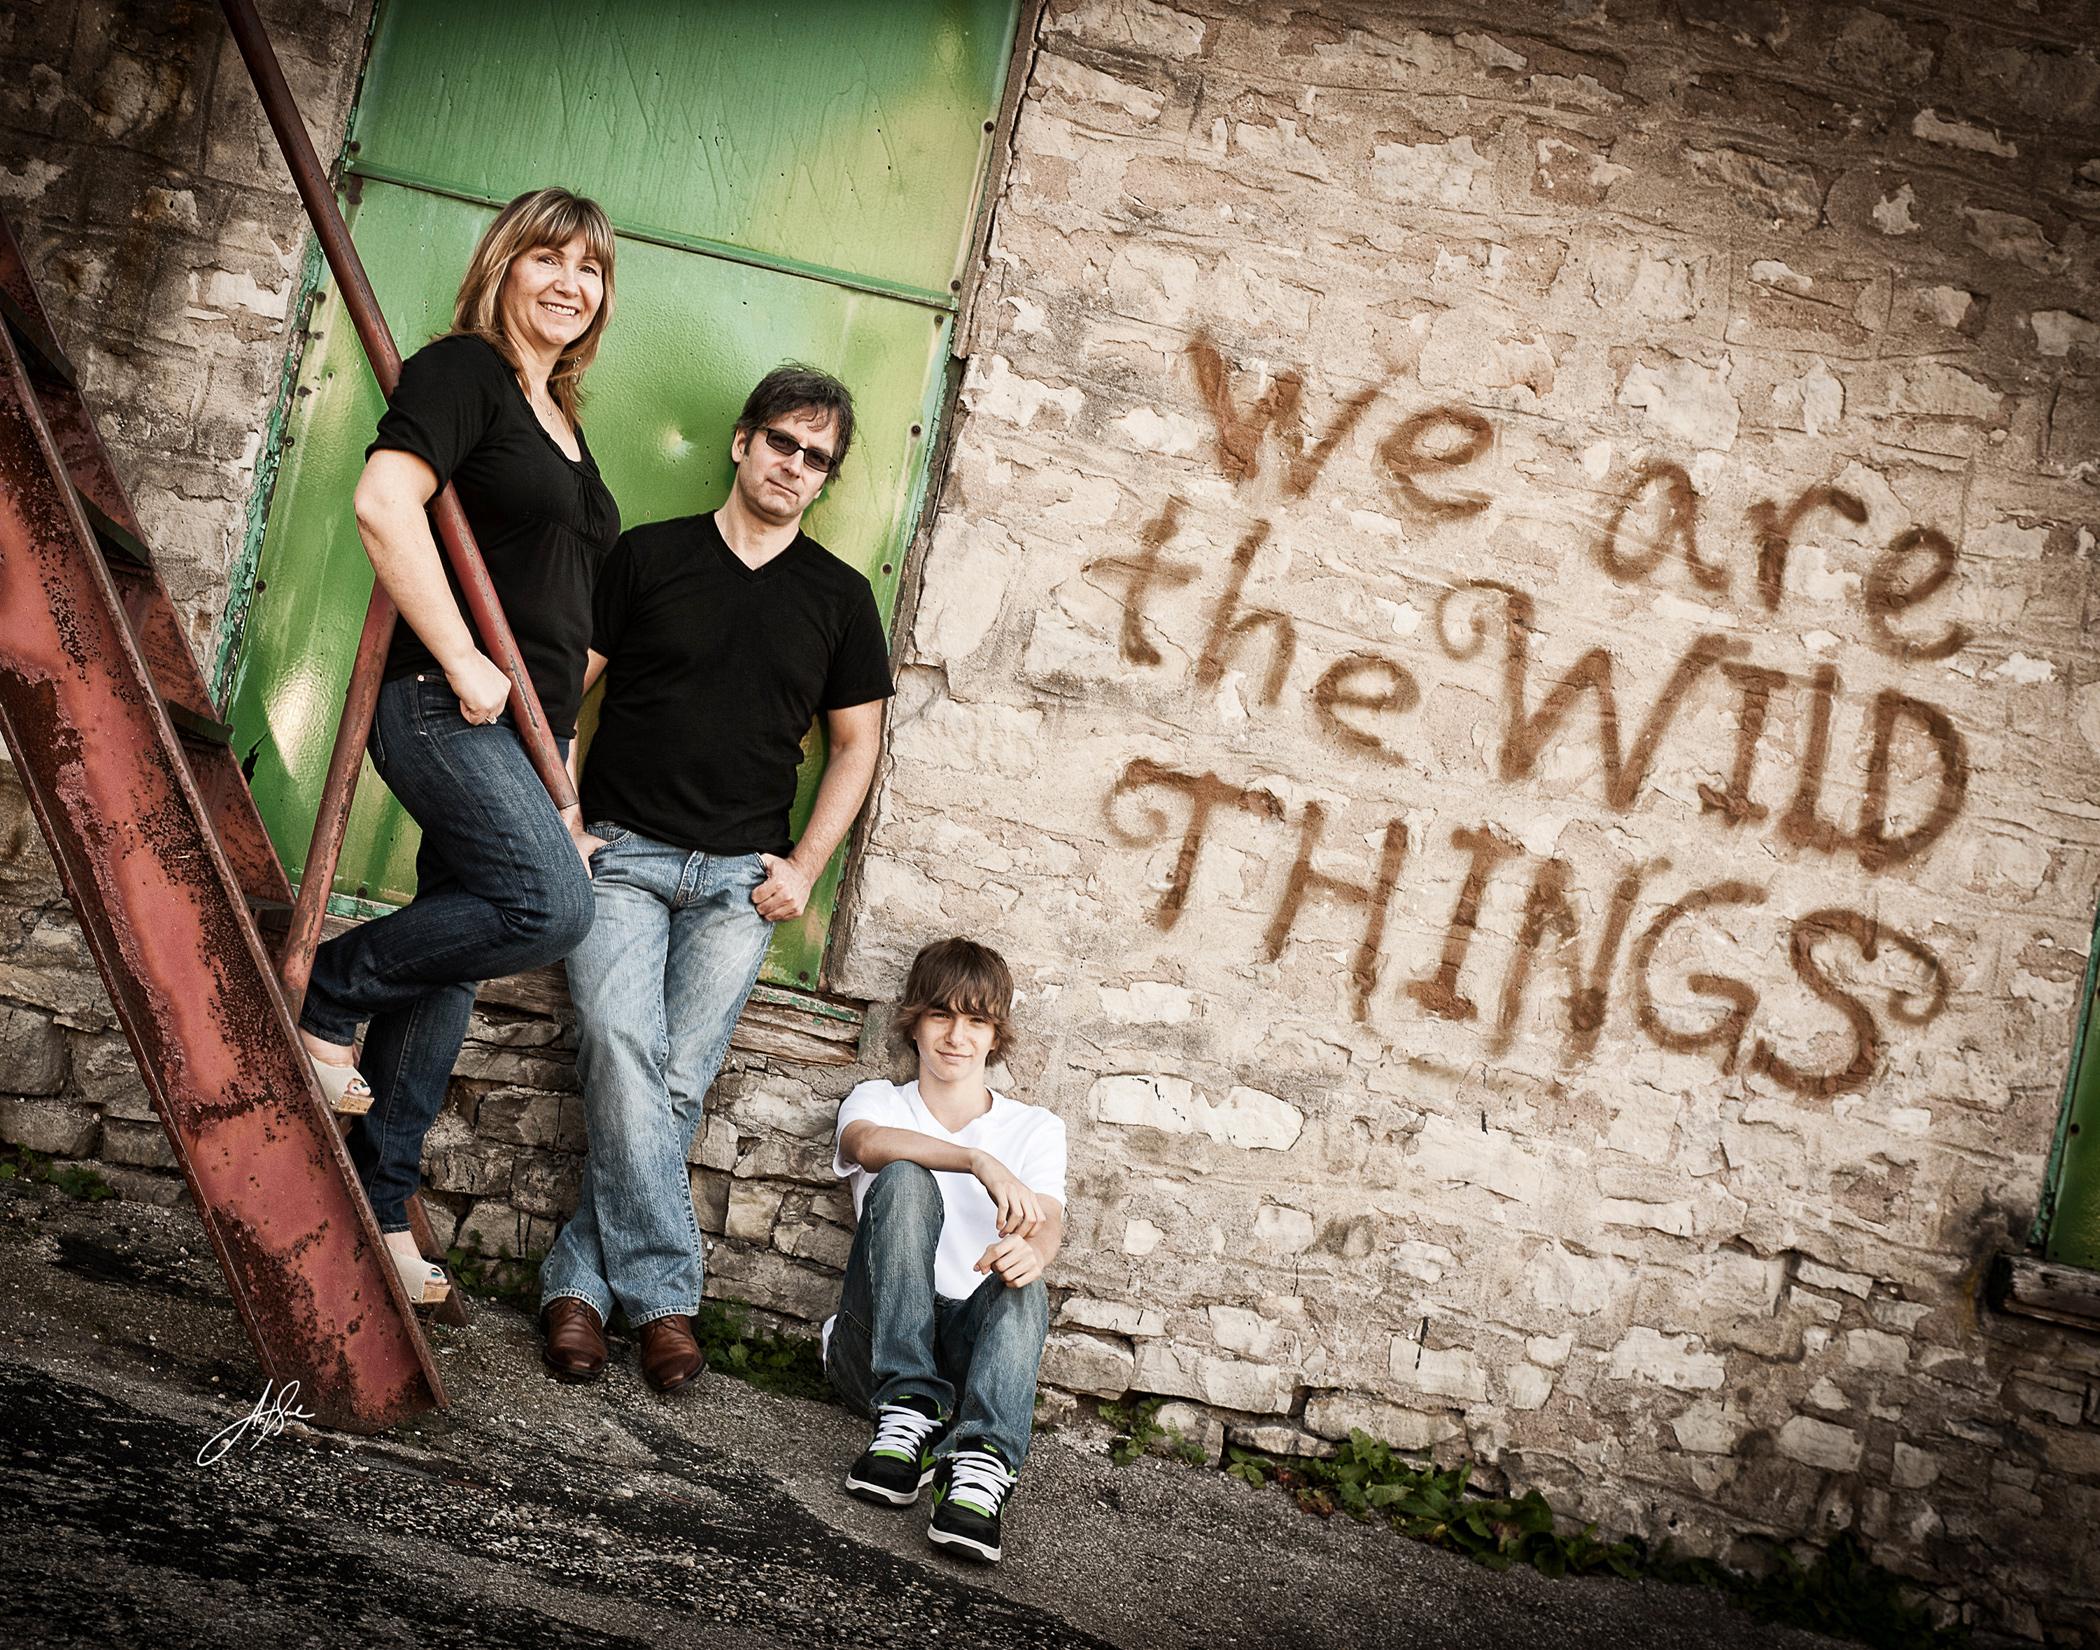 Alternative-Family-Portrait-with-Graffiti.jpg